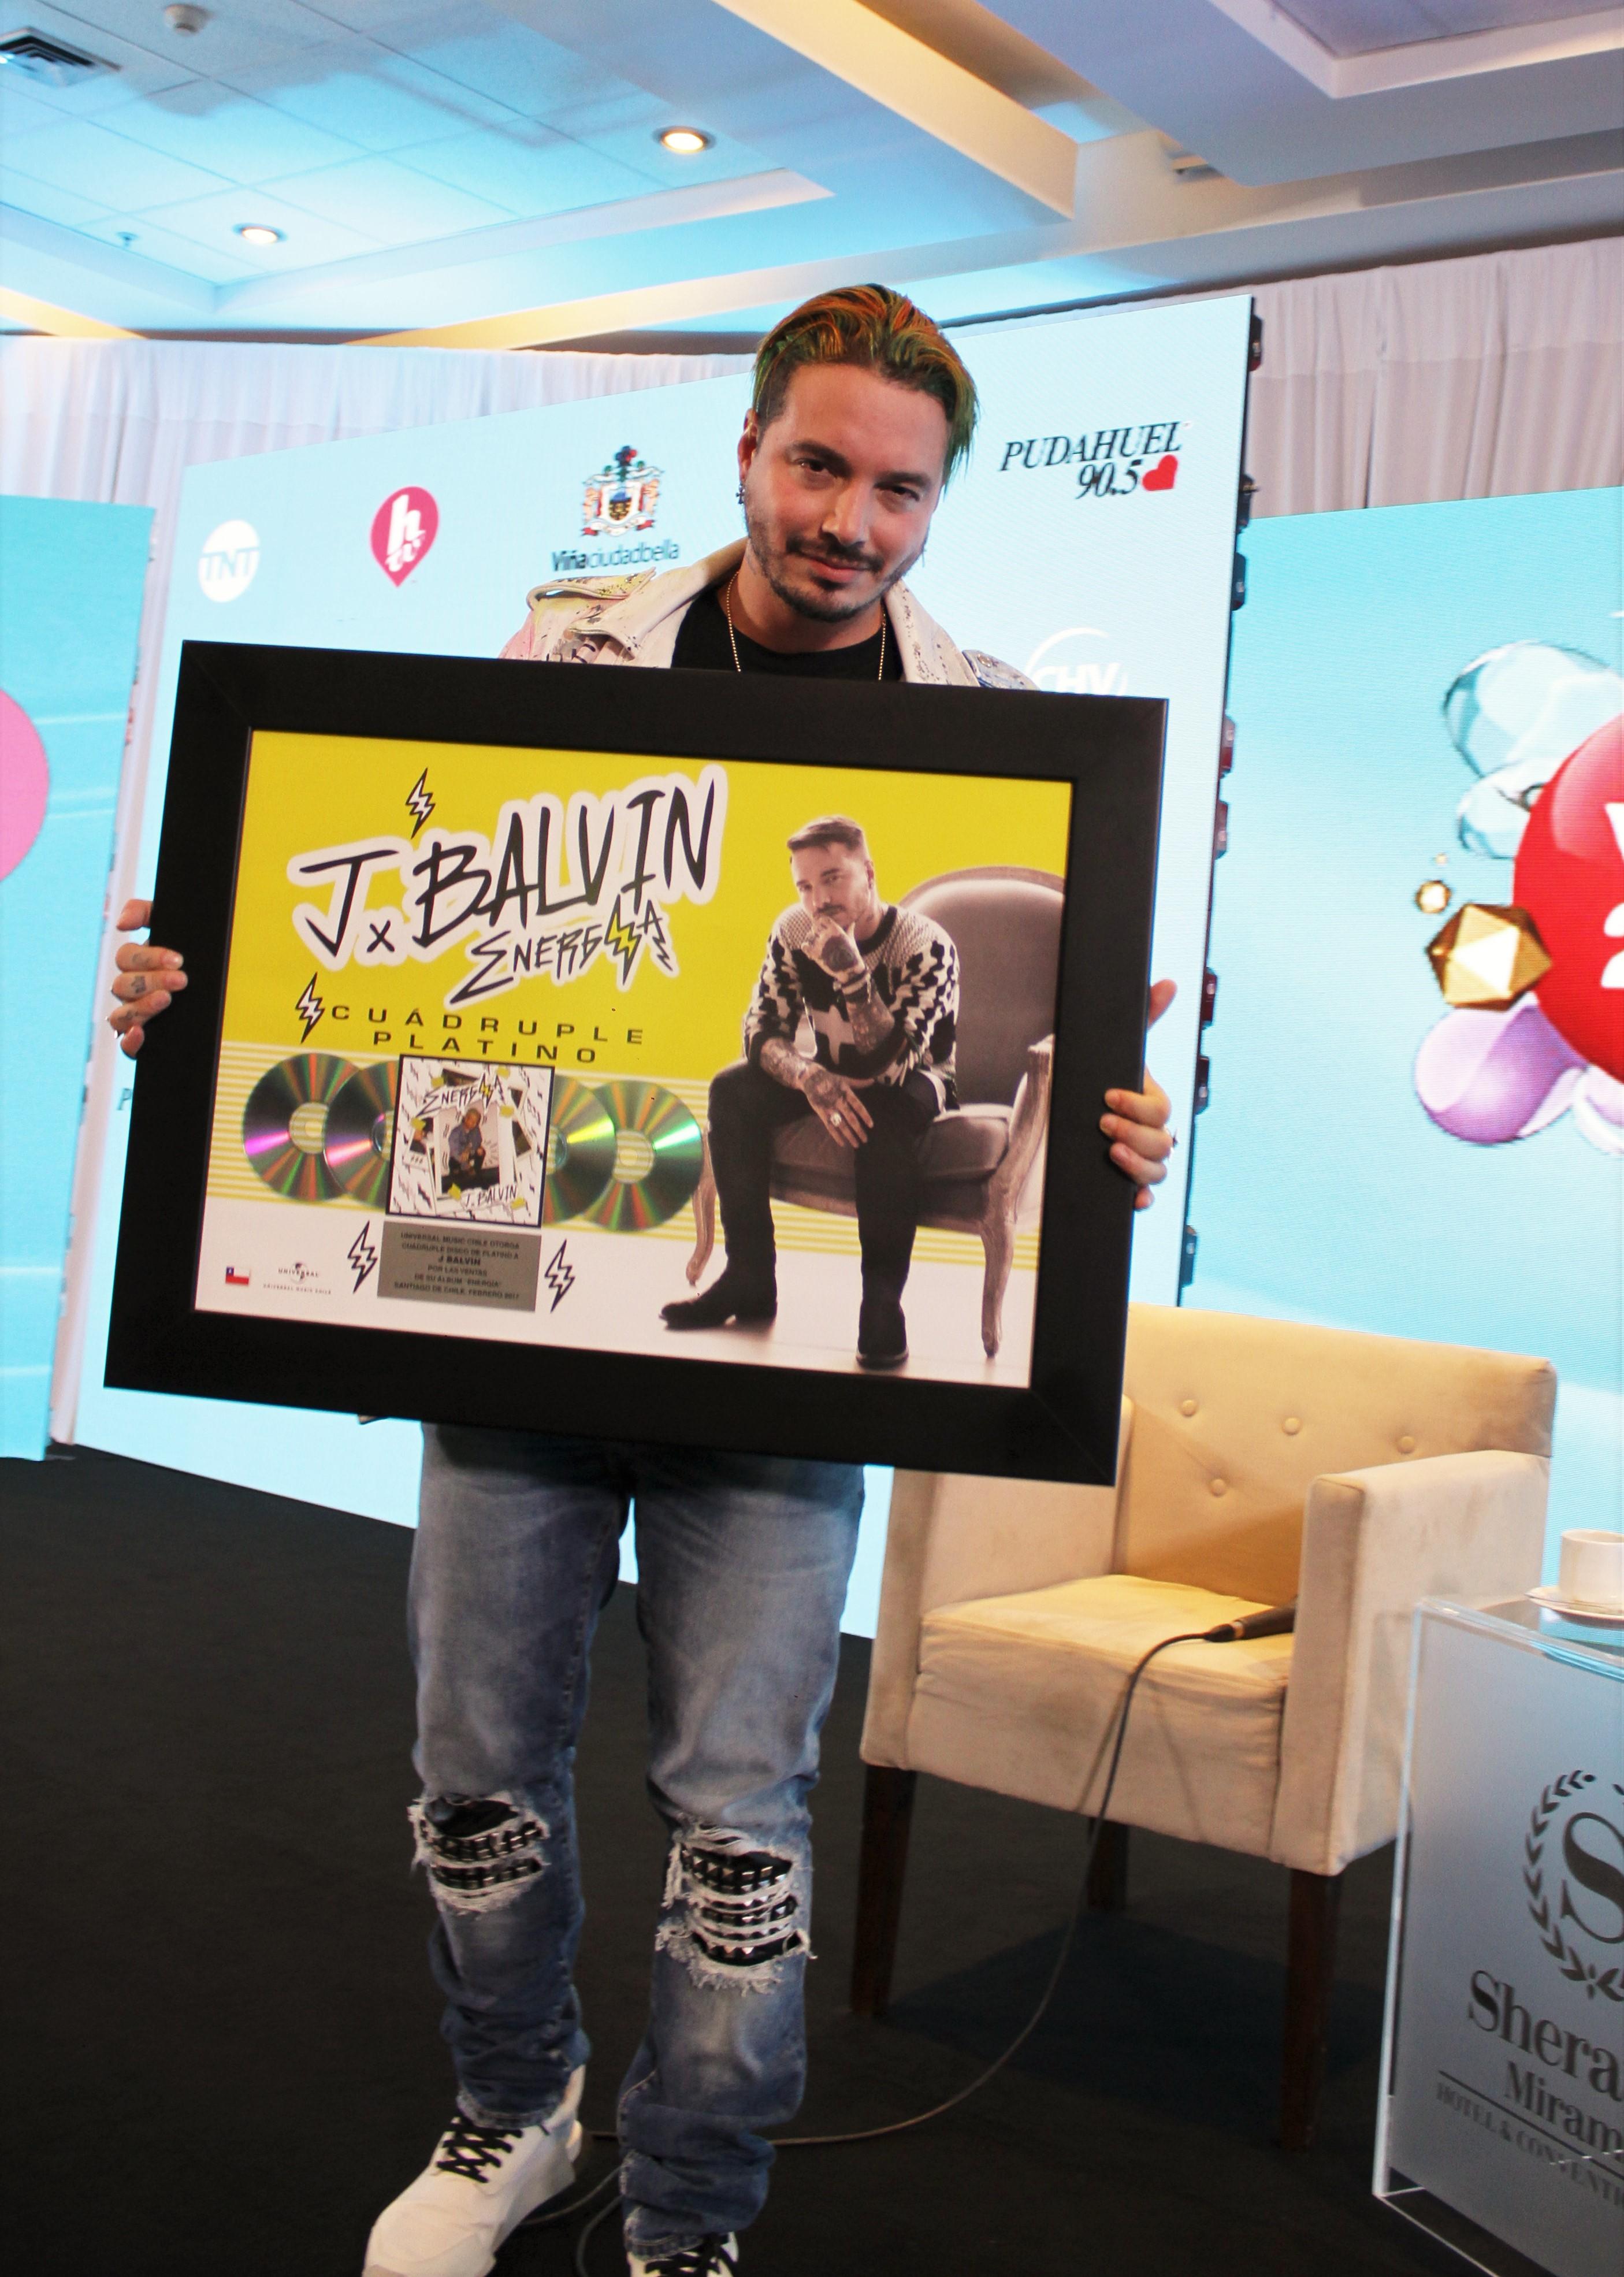 J Balvin Recibe El Cuadruple Platino en Viña del Mar